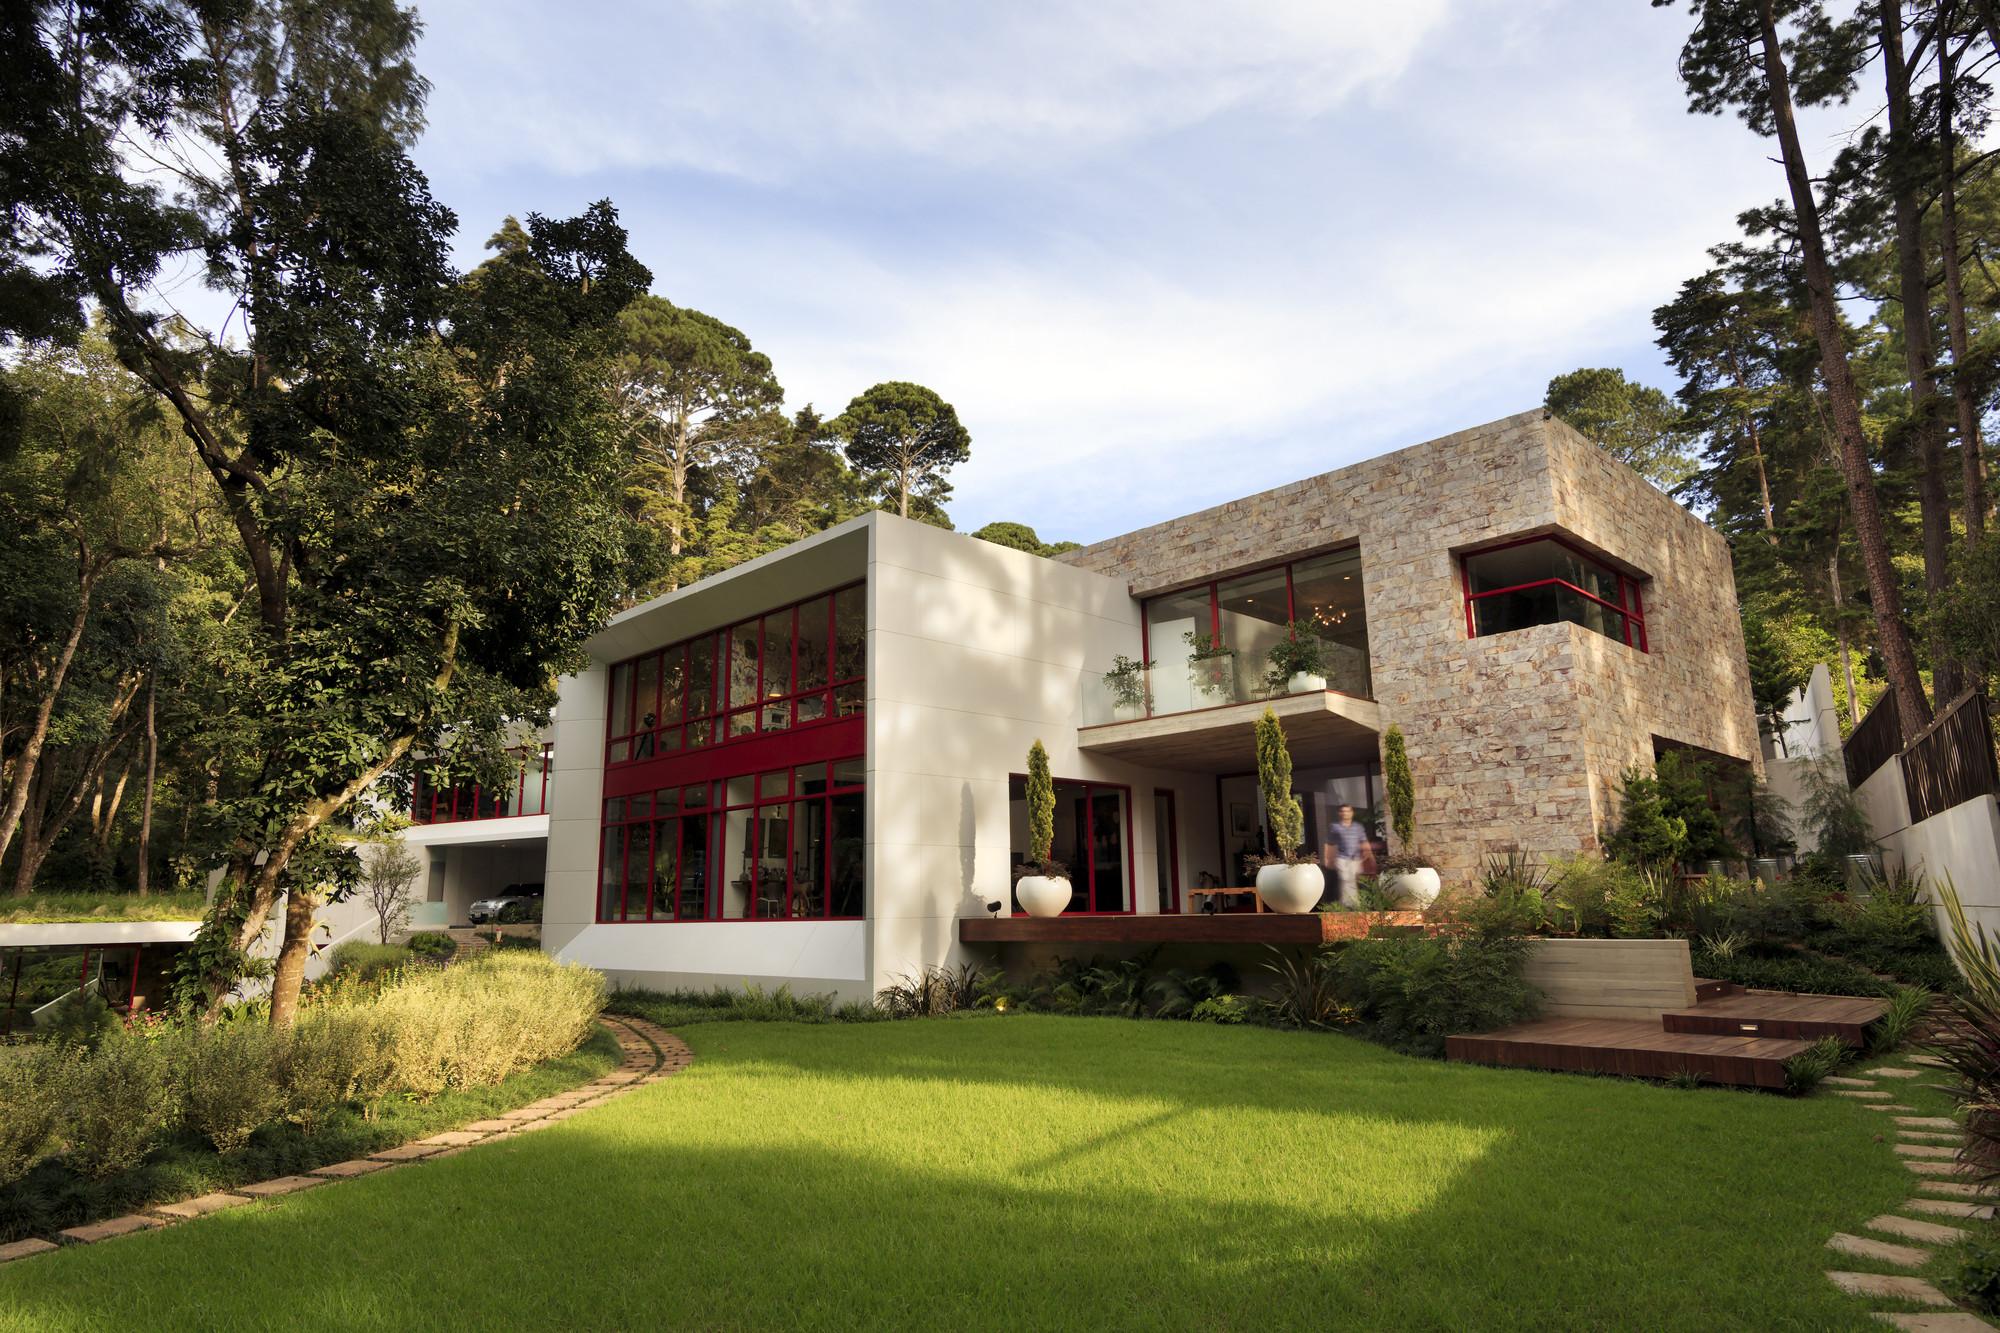 Gallery of chinkara house solis colomer arquitectos 17 for Bungalows el jardin retalhuleu guatemala